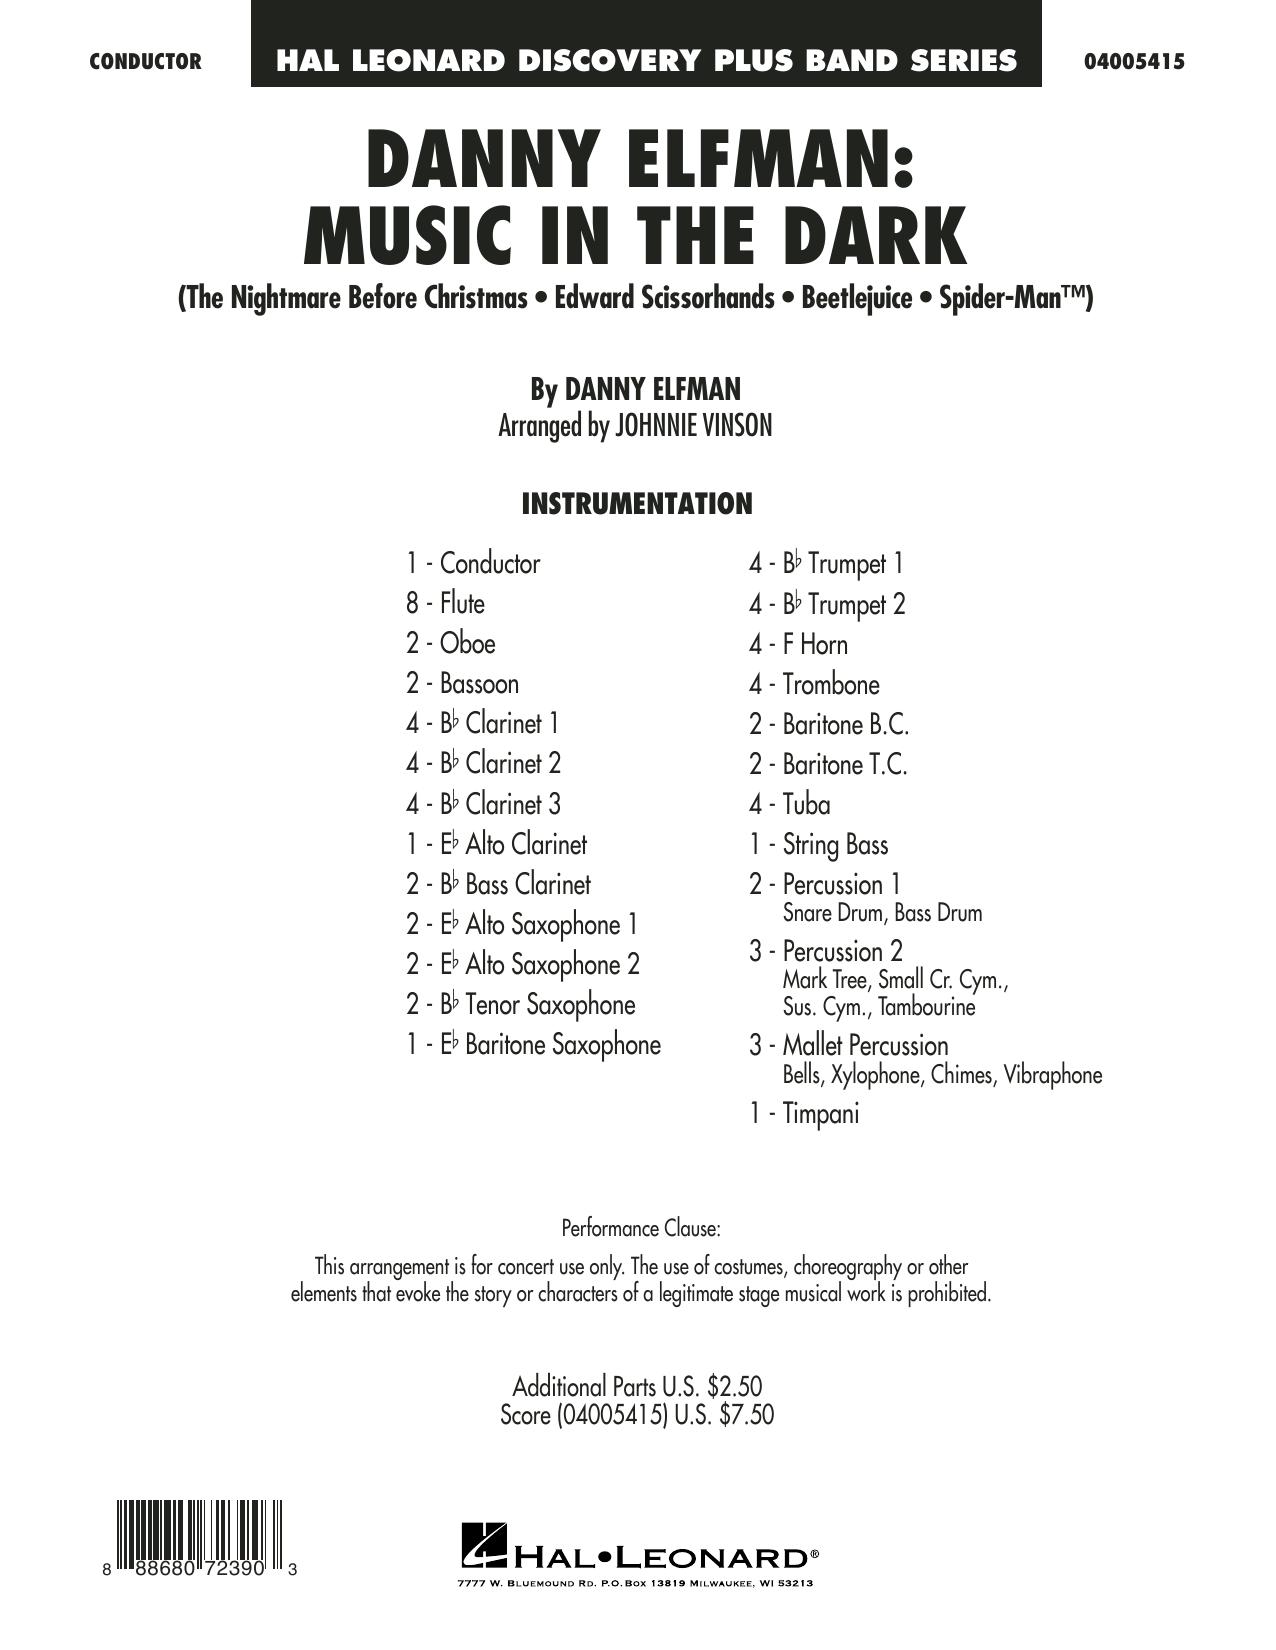 Danny Elfman: Music in the Dark - Conductor Score (Full Score) (Concert Band)